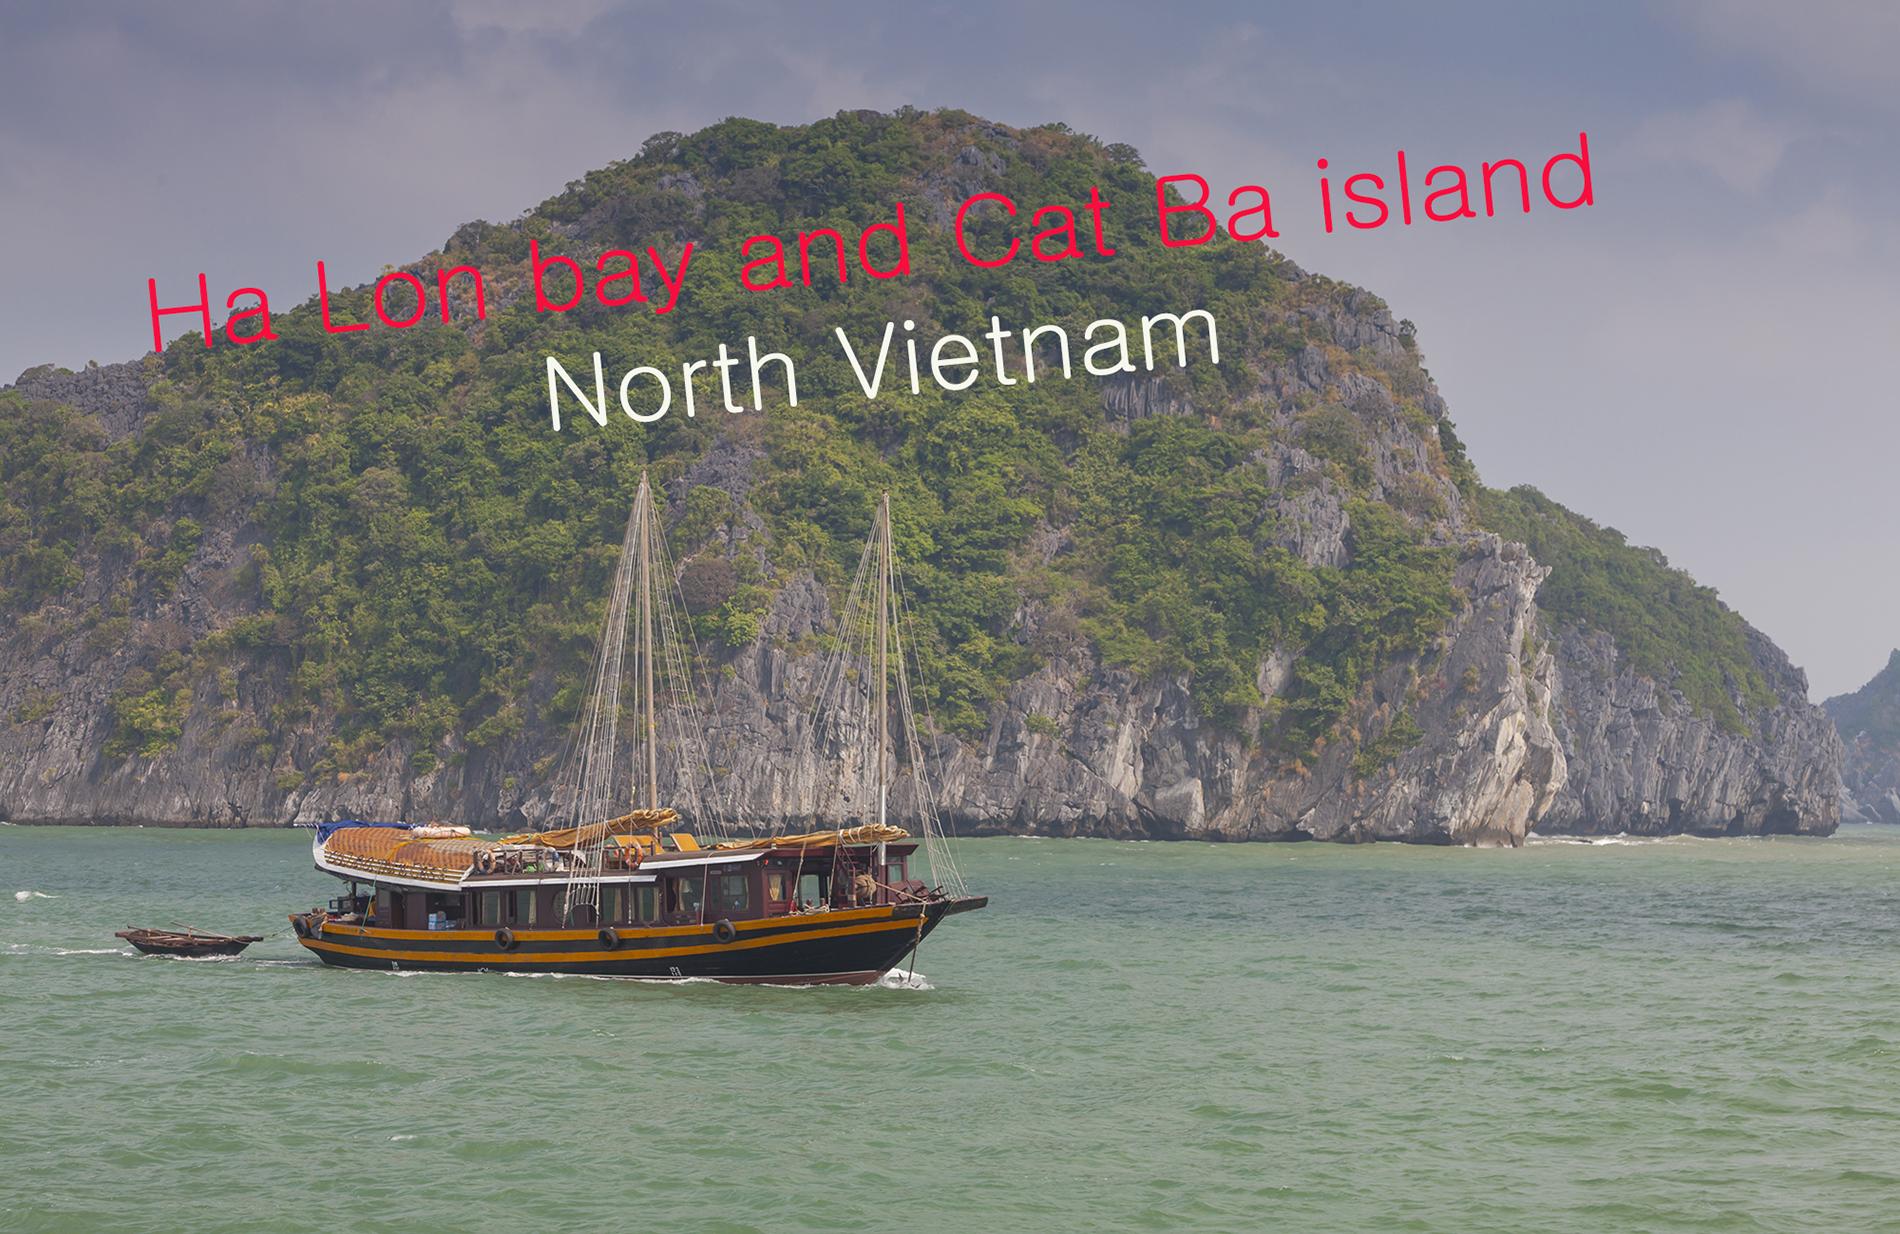 Видео экскурсия по бухте Халонг и острову Катба